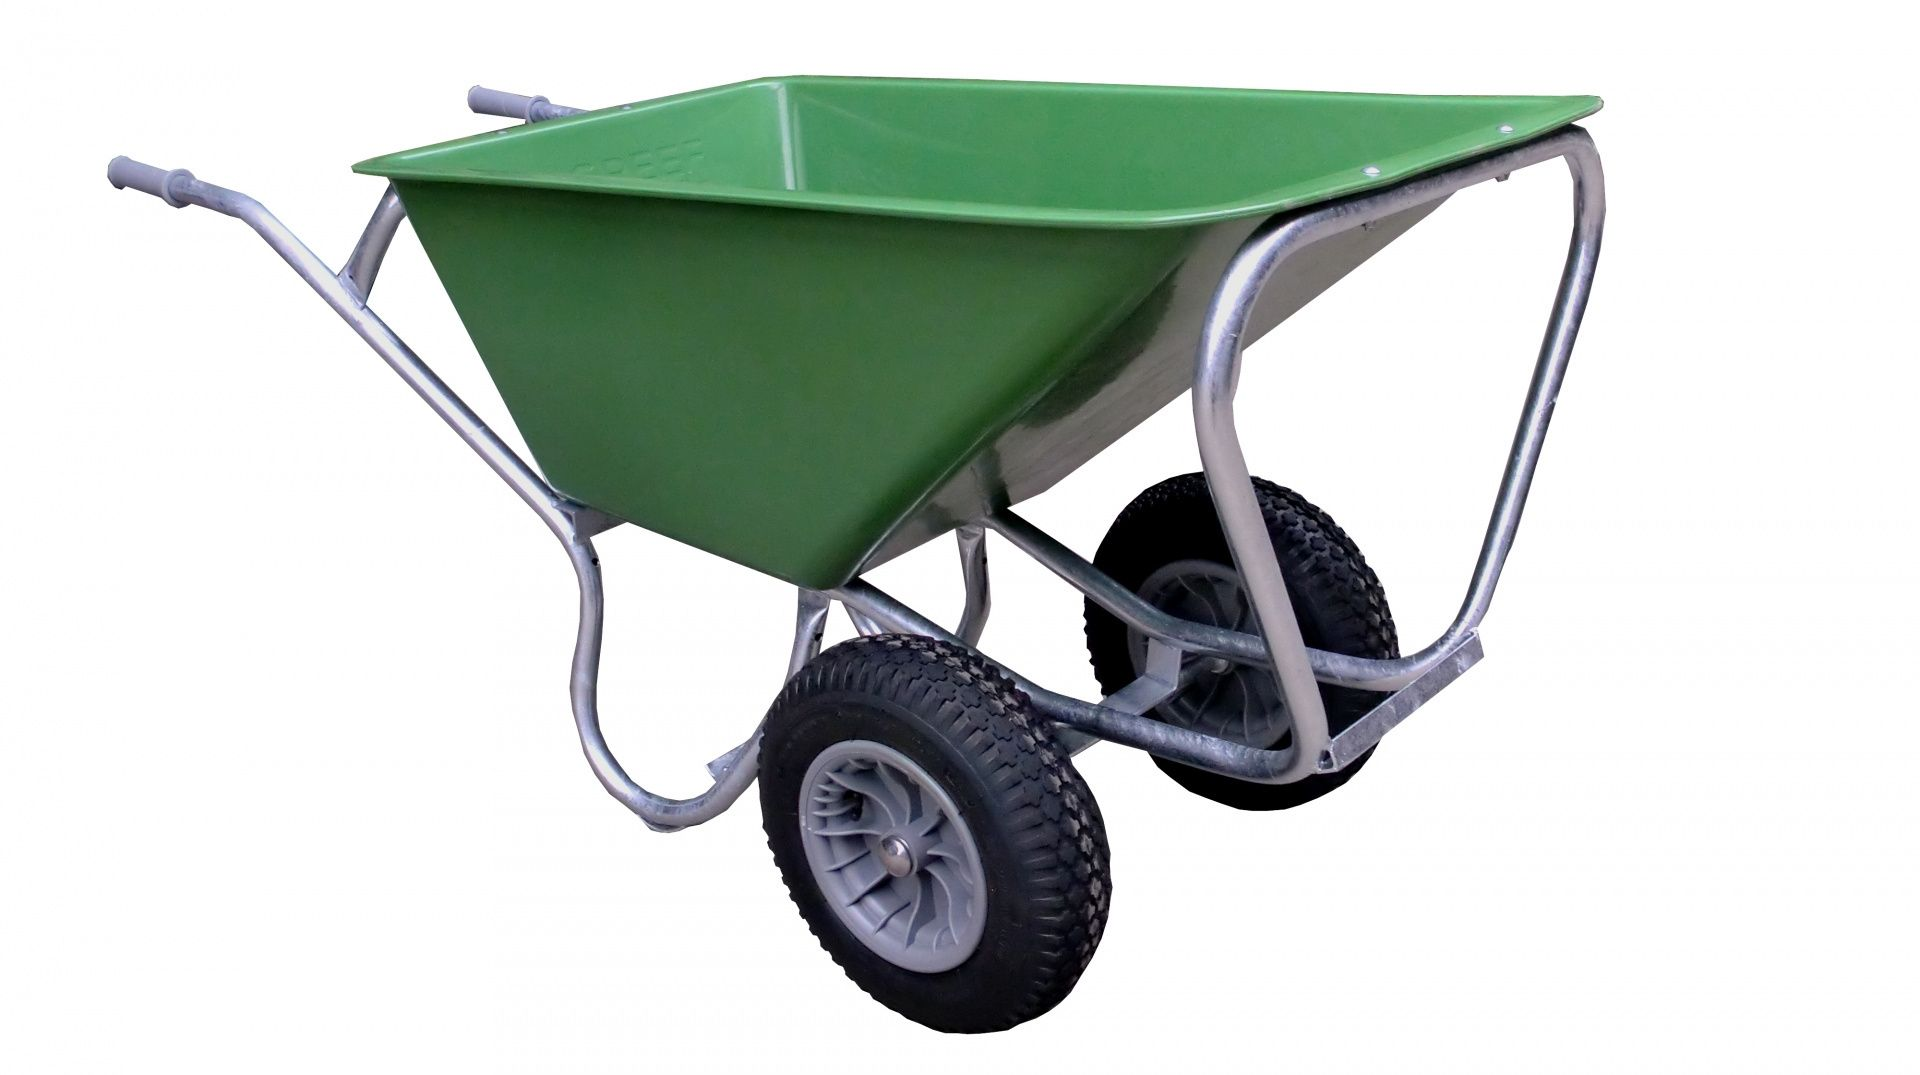 Stal kruiwagen Hummer Pro groen 160 ltr 2 wielen